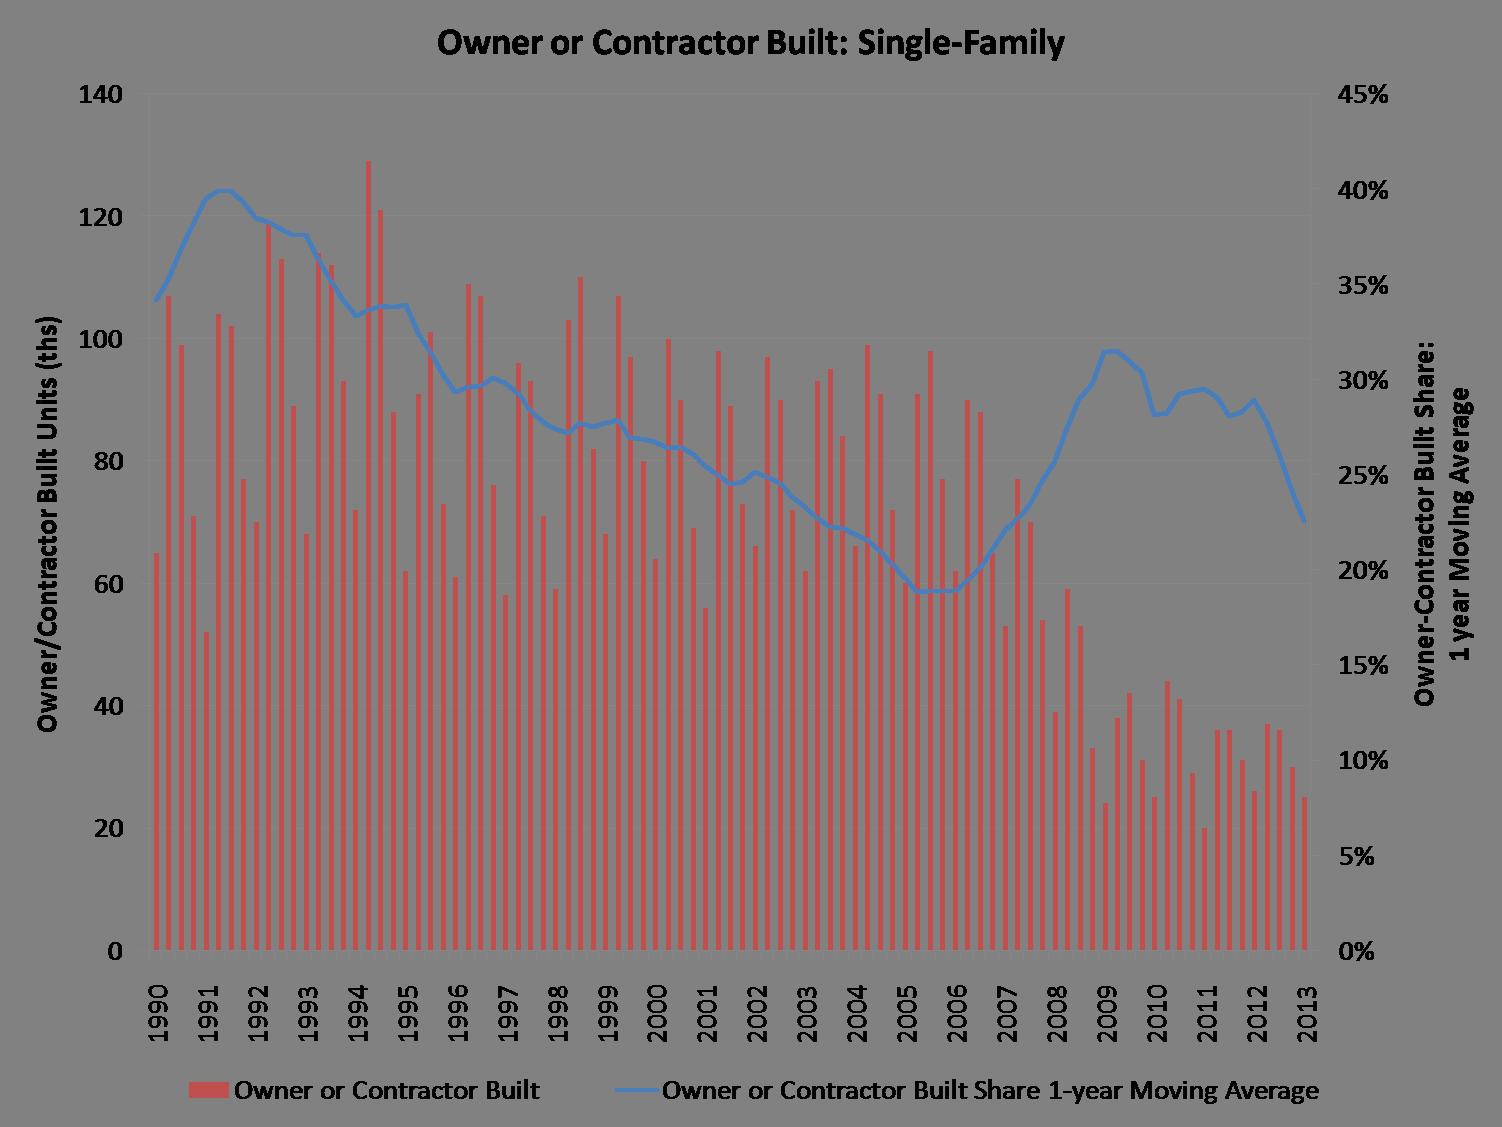 owner_contractor built_1q13